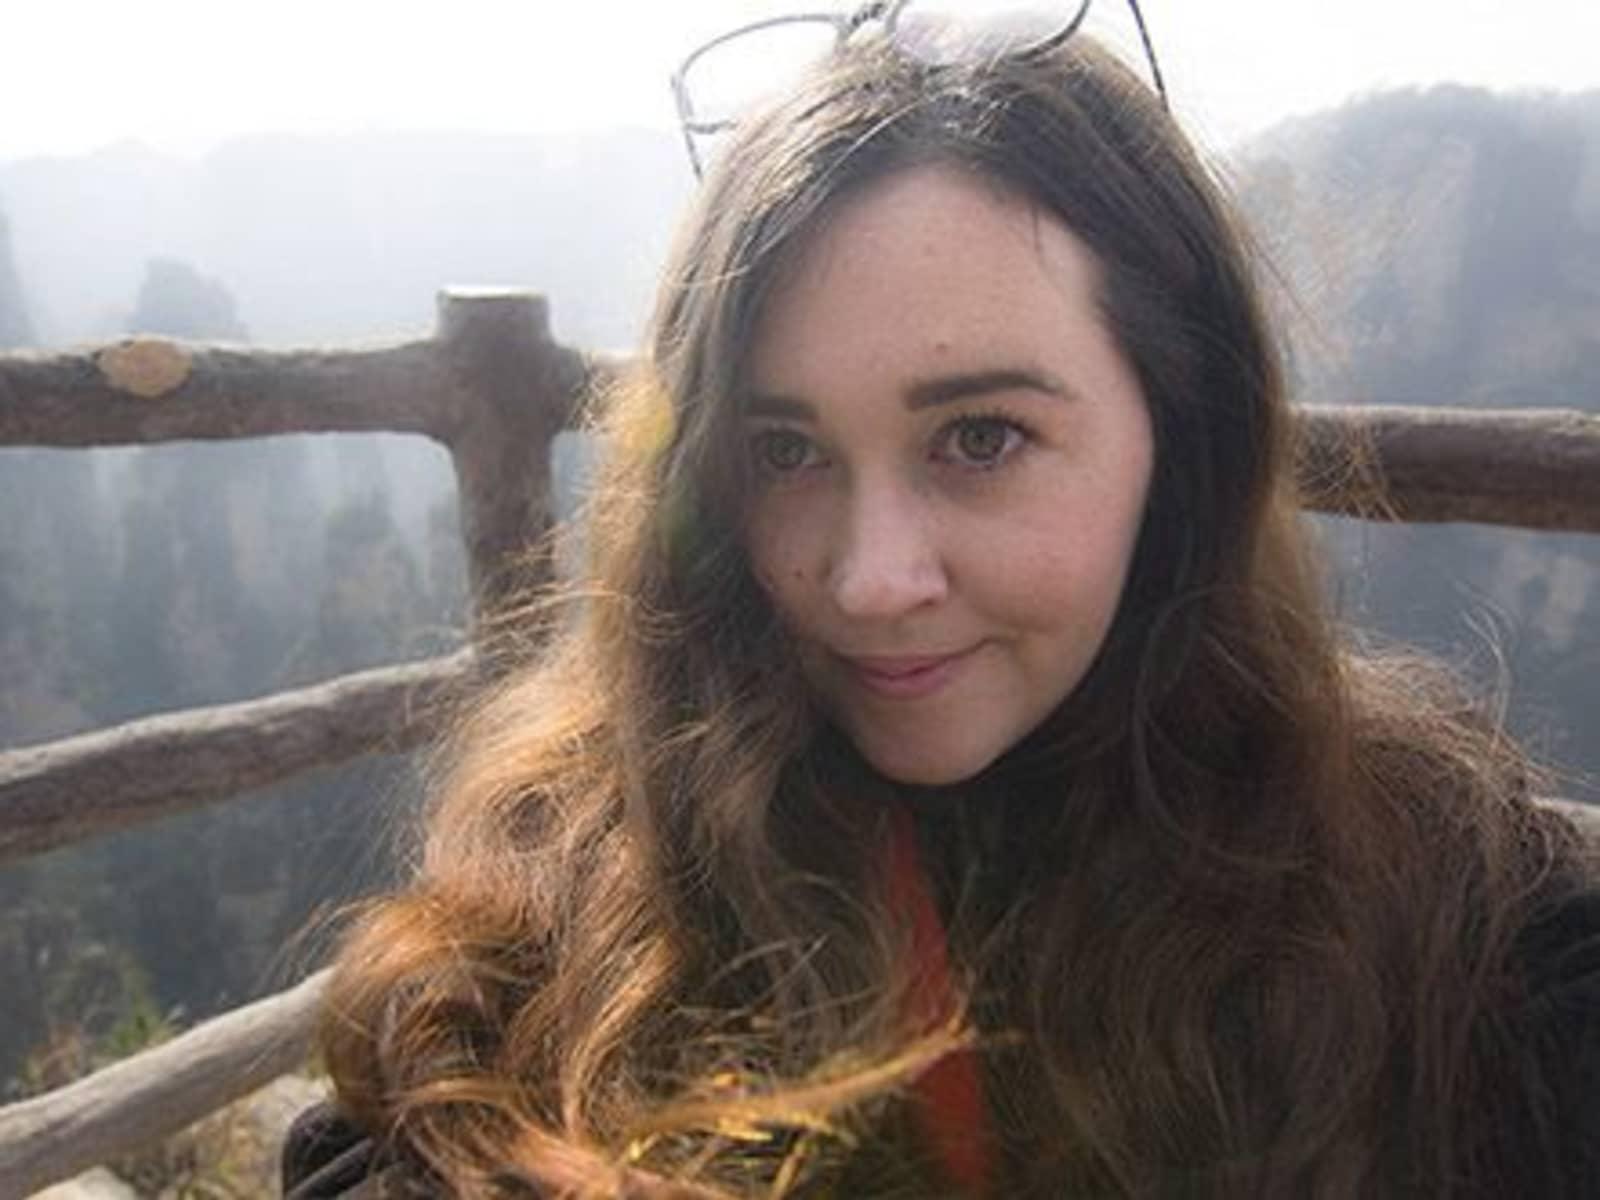 Alexandrea from Hanoi, Vietnam